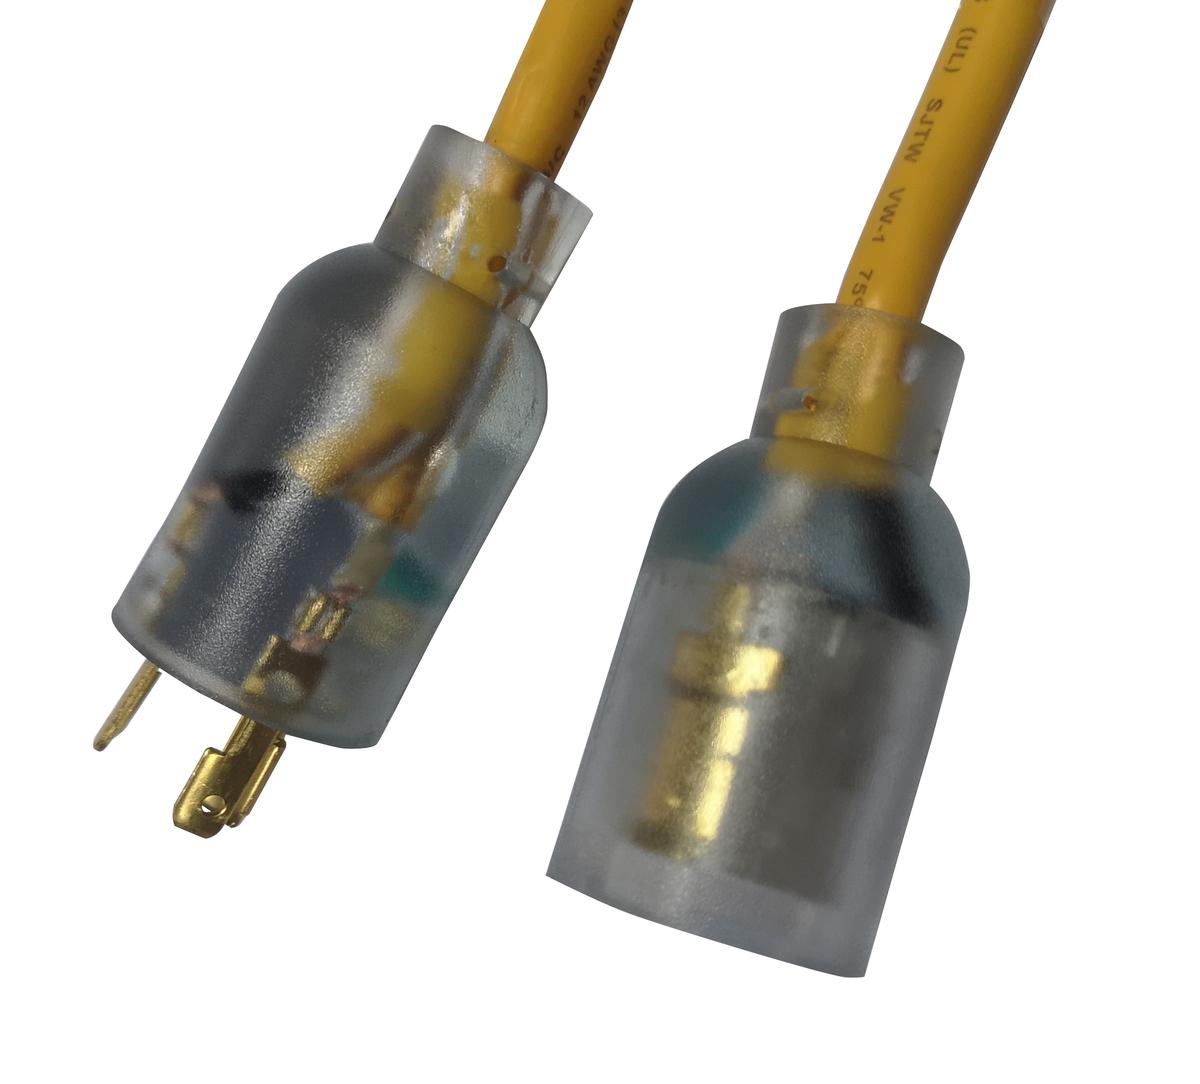 12/3 Heavy Duty 15 Amp SJTW Twist-To-Lock Extension Cord, 100